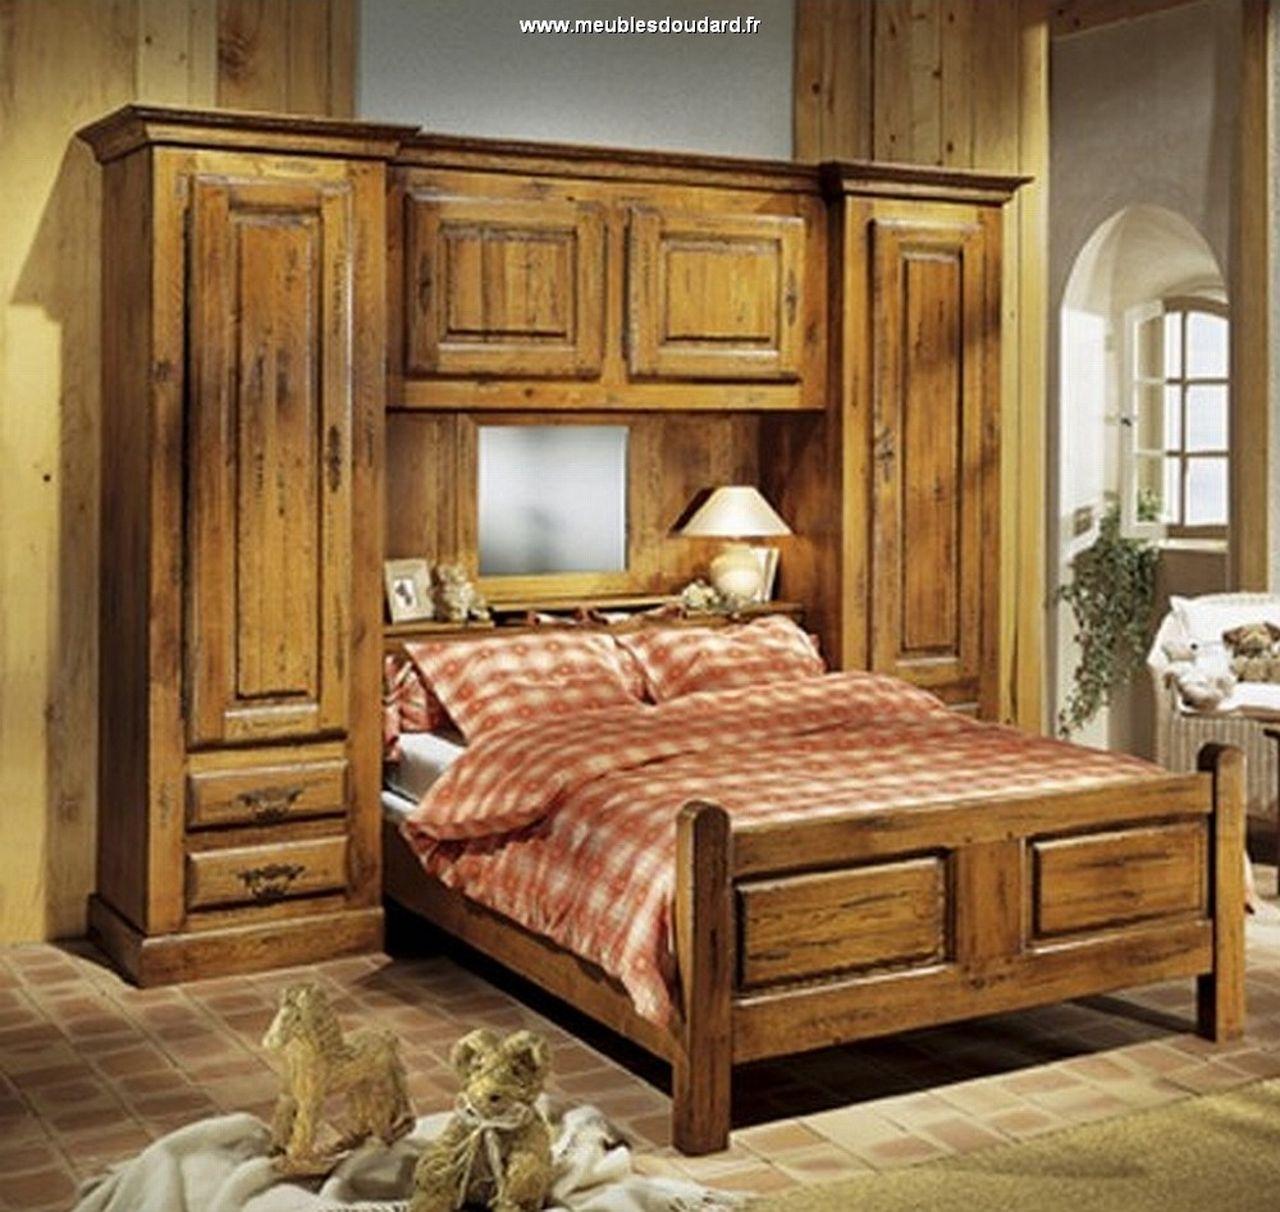 Chambre Chene Massif : Chambre pont chêne meuble de rustique